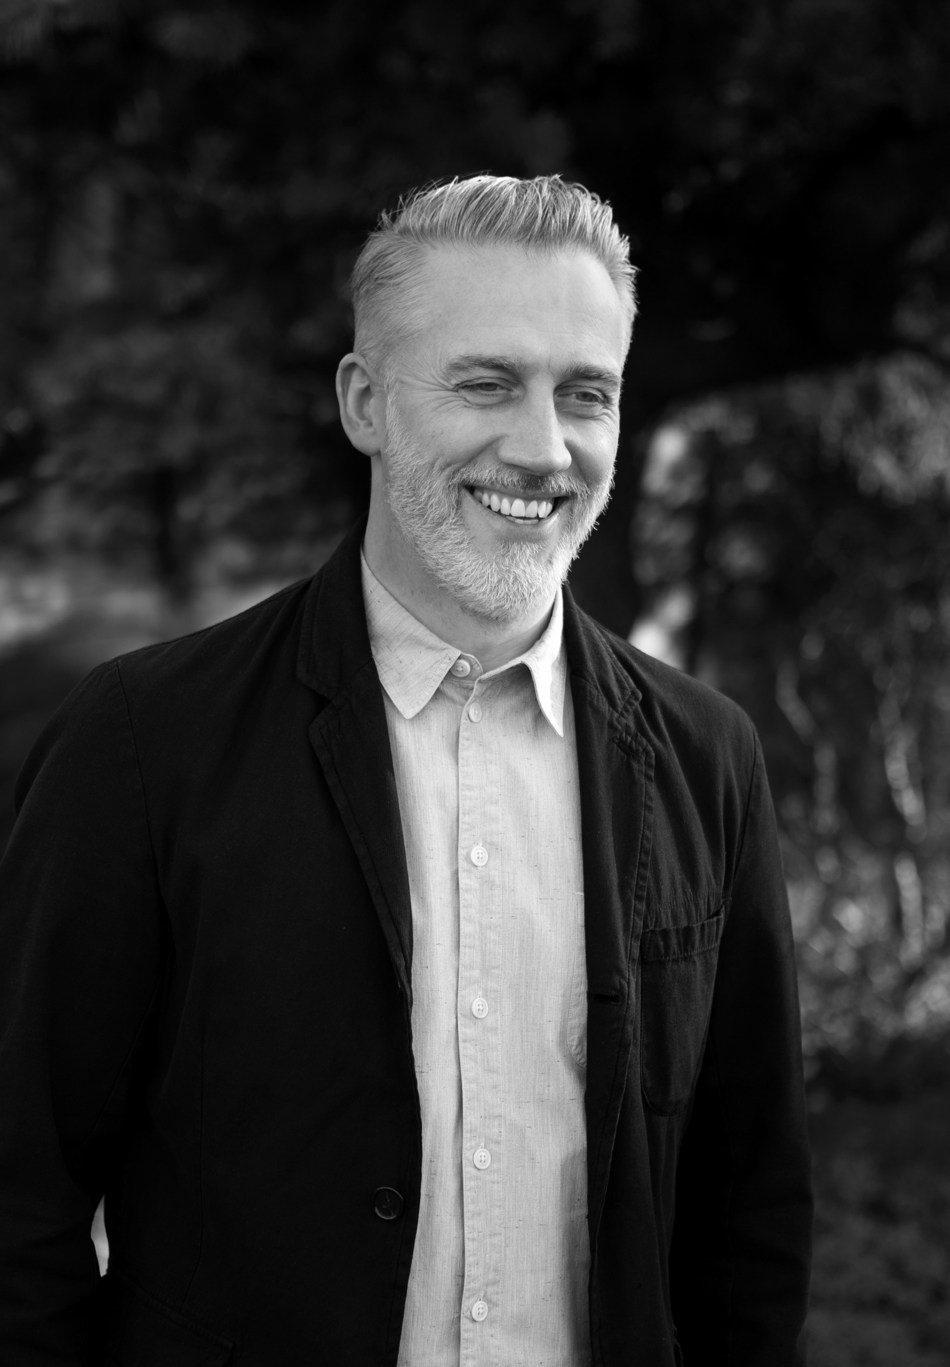 Steve Owen Joins Siegel+Gale as Executive Creative Director for EMEA. (PRNewsFoto/Siegel+Gale)